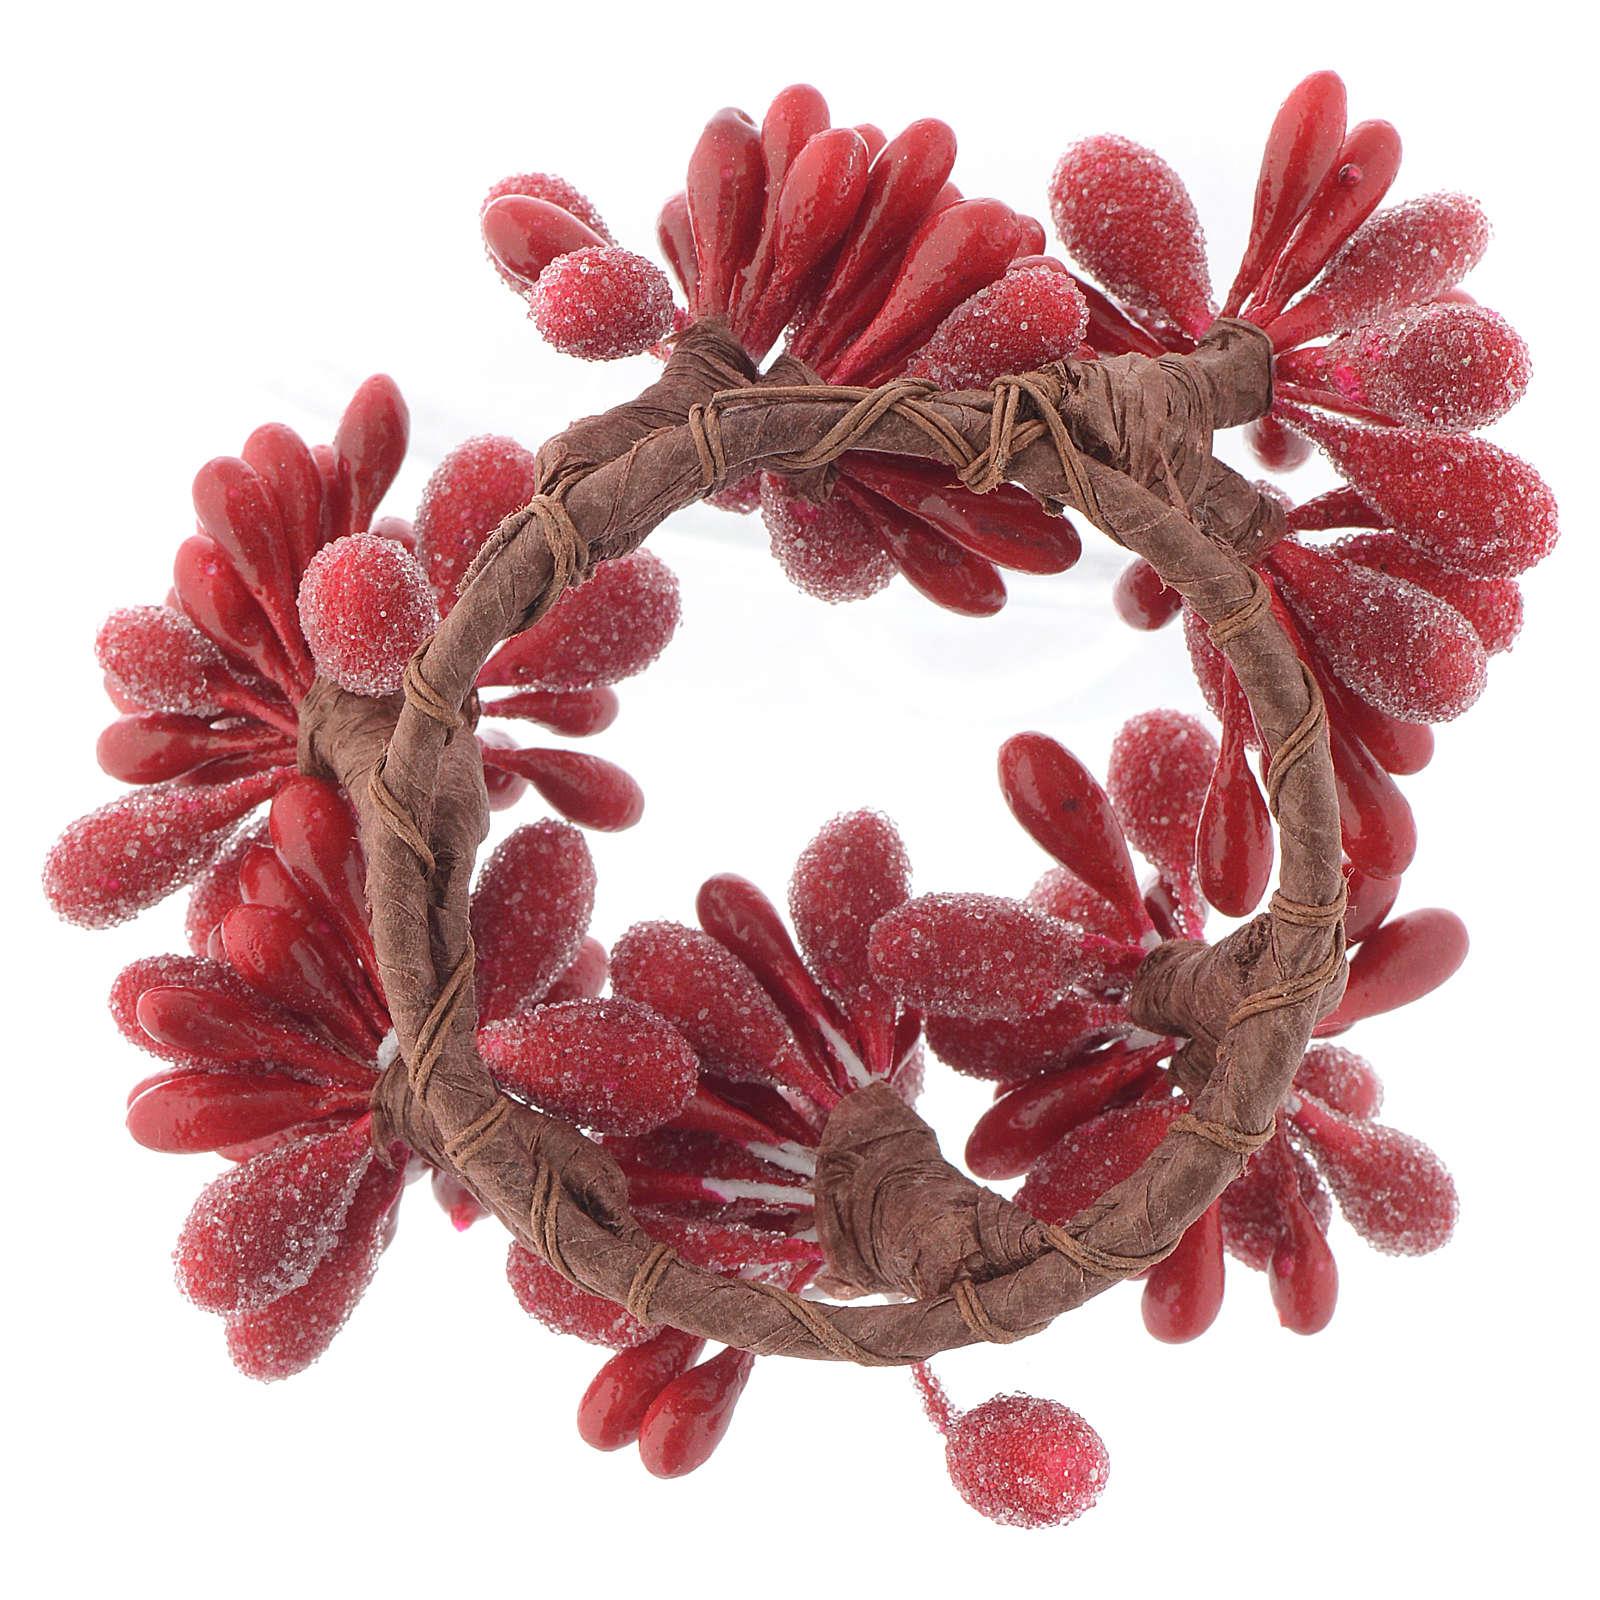 Centro de mesa para Navidad rojo con bayas piñas velas 4 cm 3